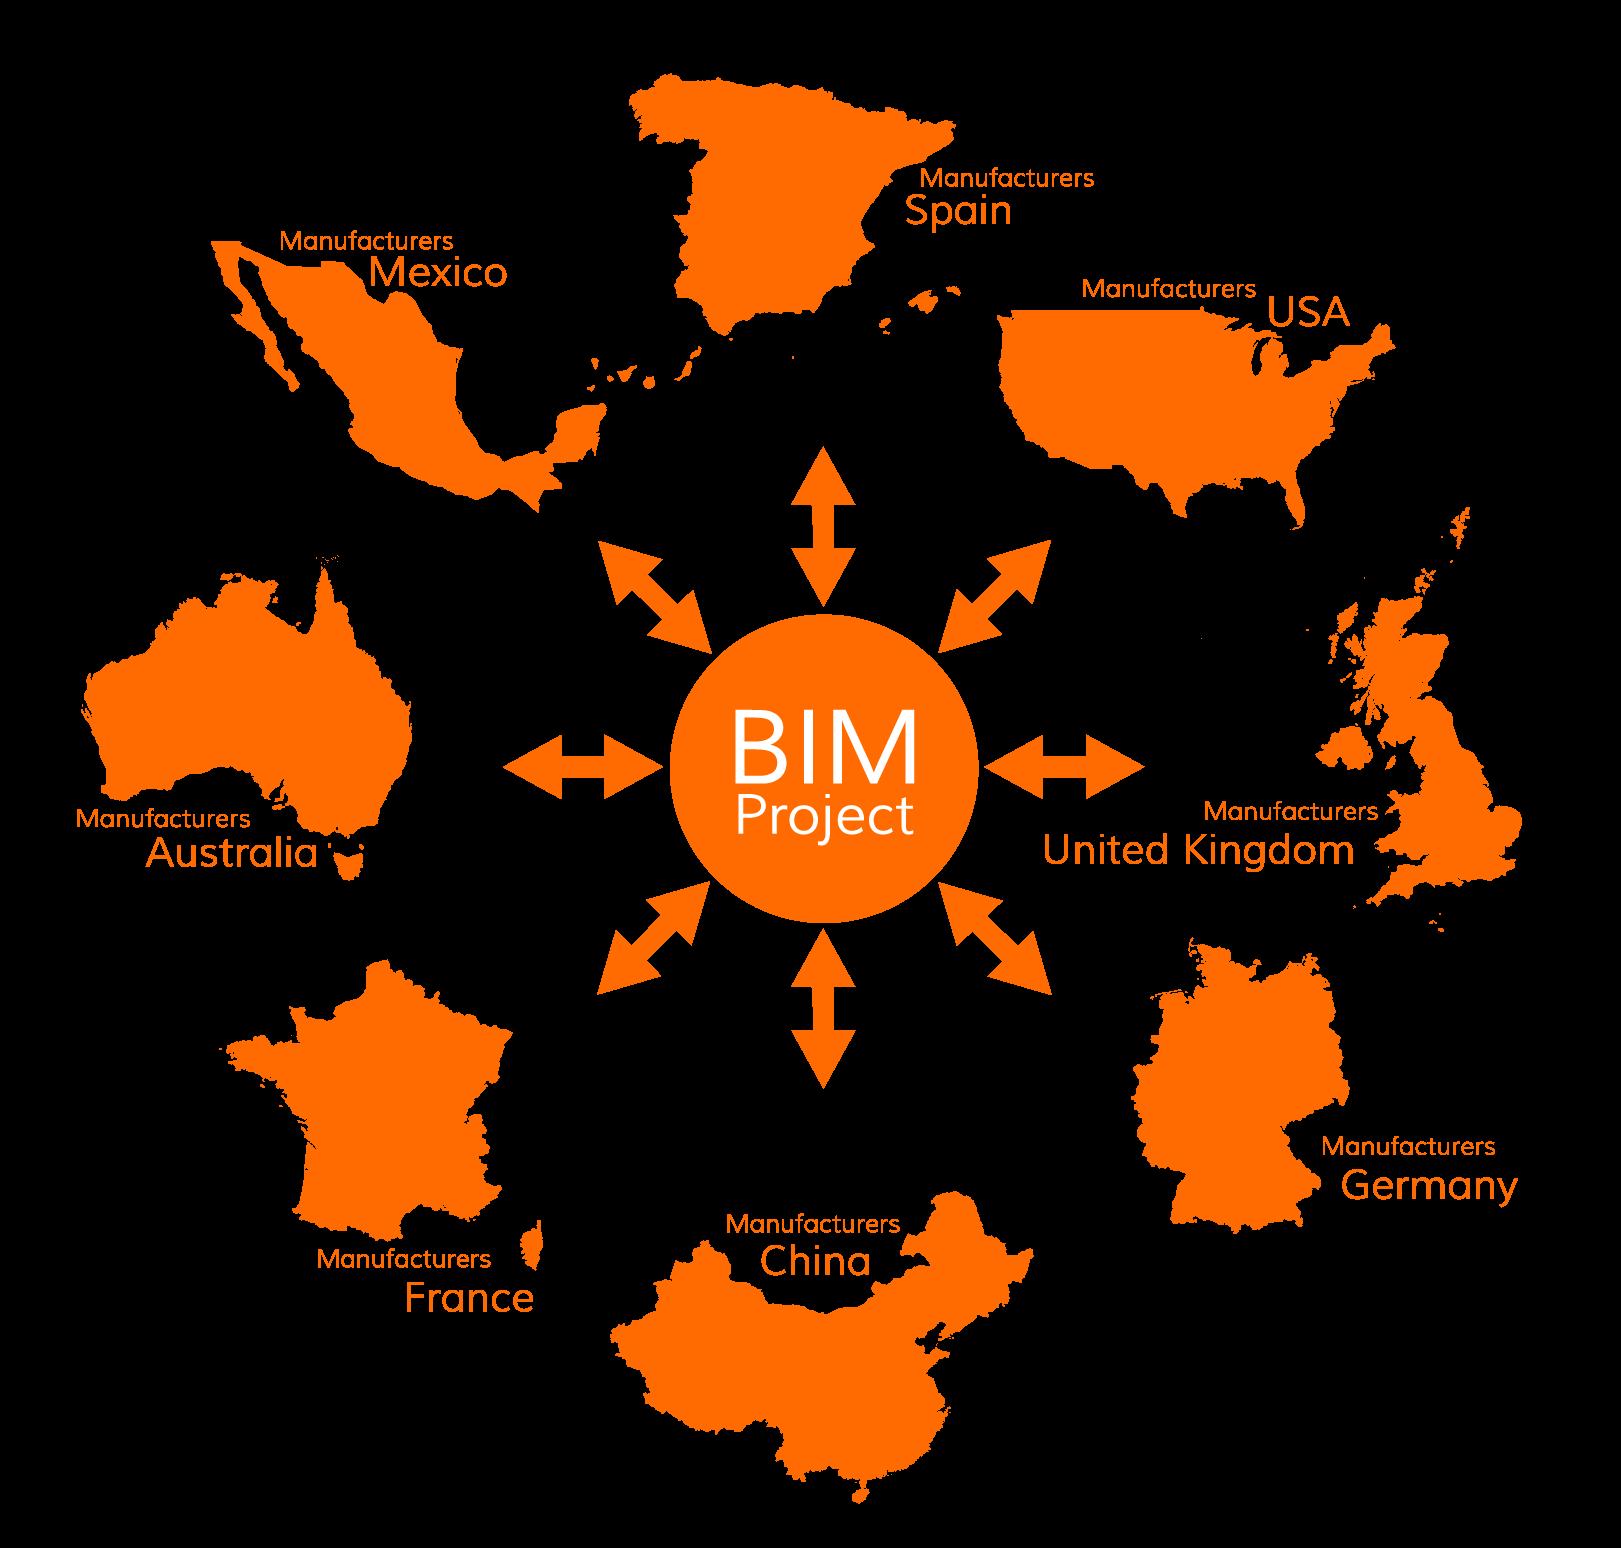 mapa-proyecto-bim-en-04